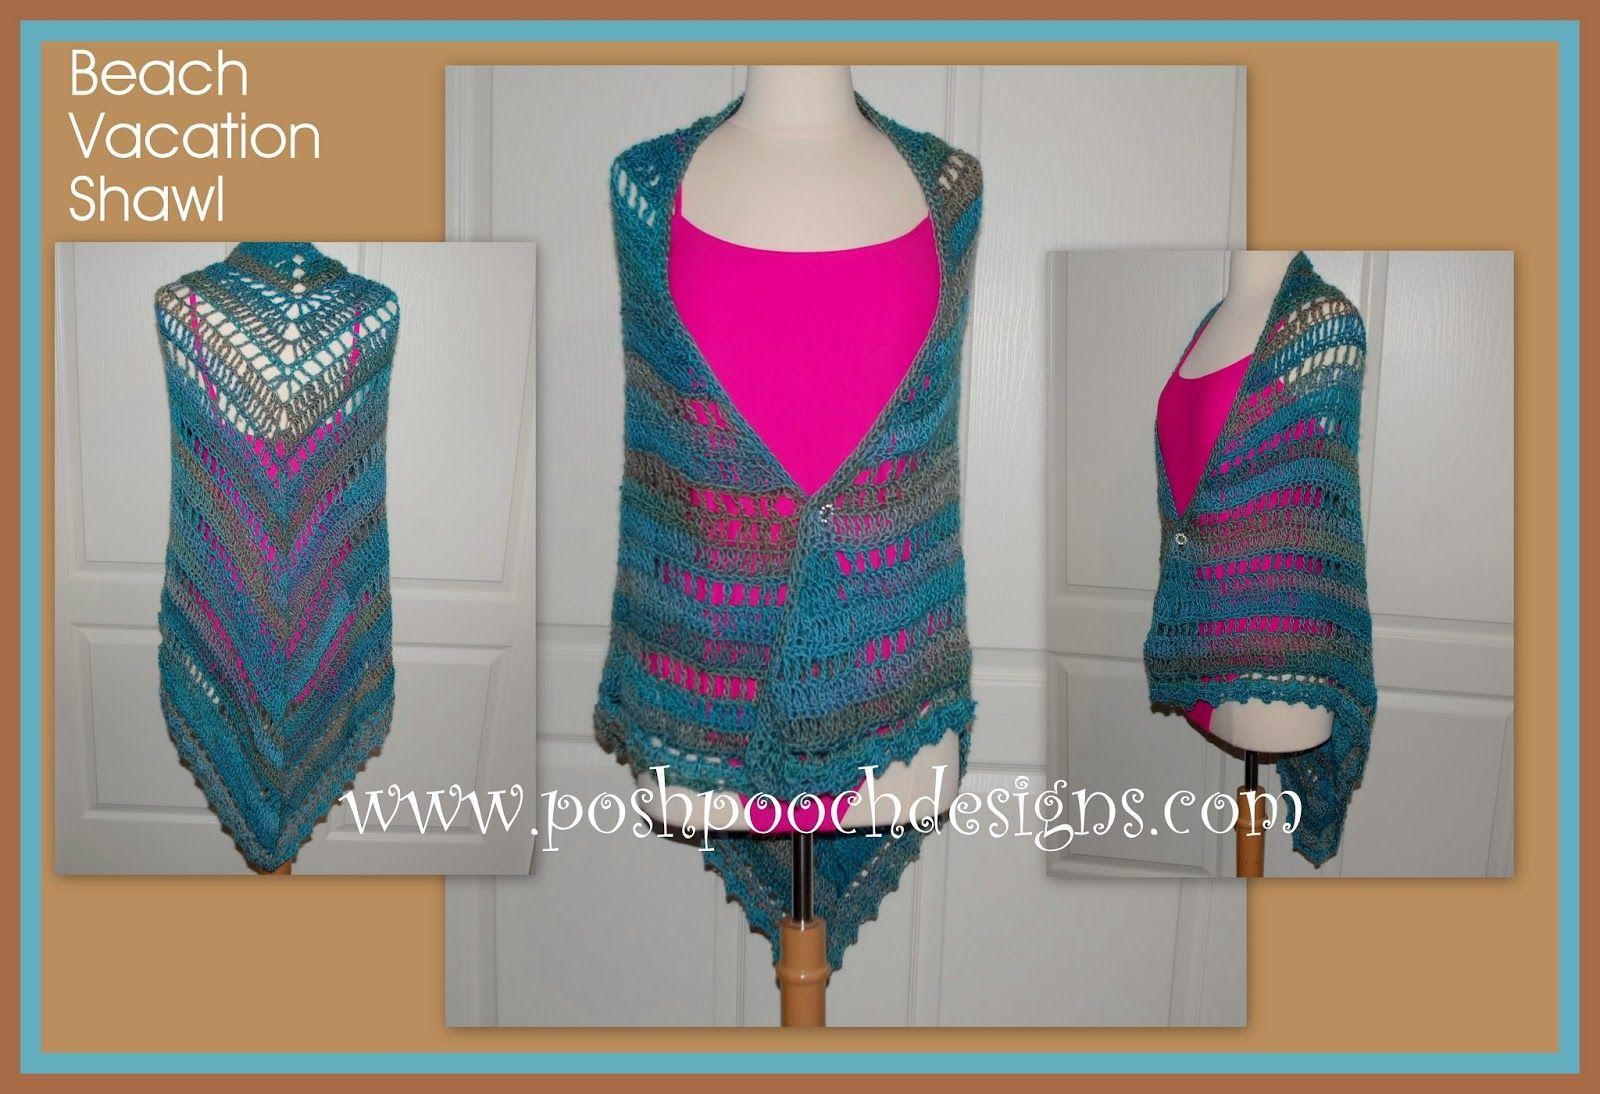 Posh Pooch Designs Dog Clothes: Beach Vacation Shawl Free Crochet Pattern | Posh Pooch Designs